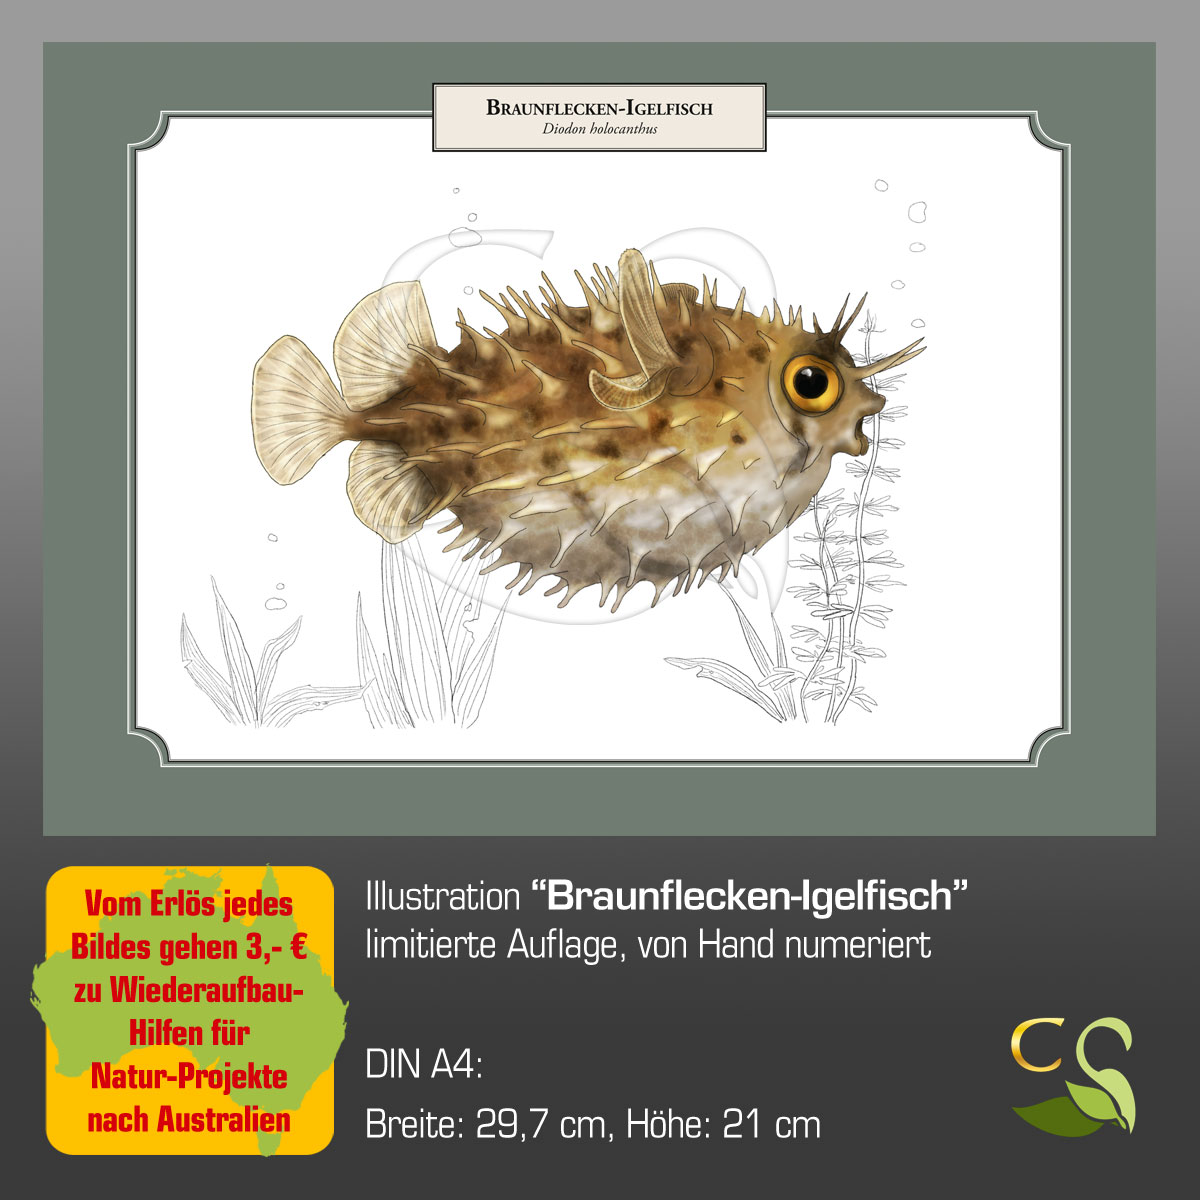 BraunfIgelfischA4fA